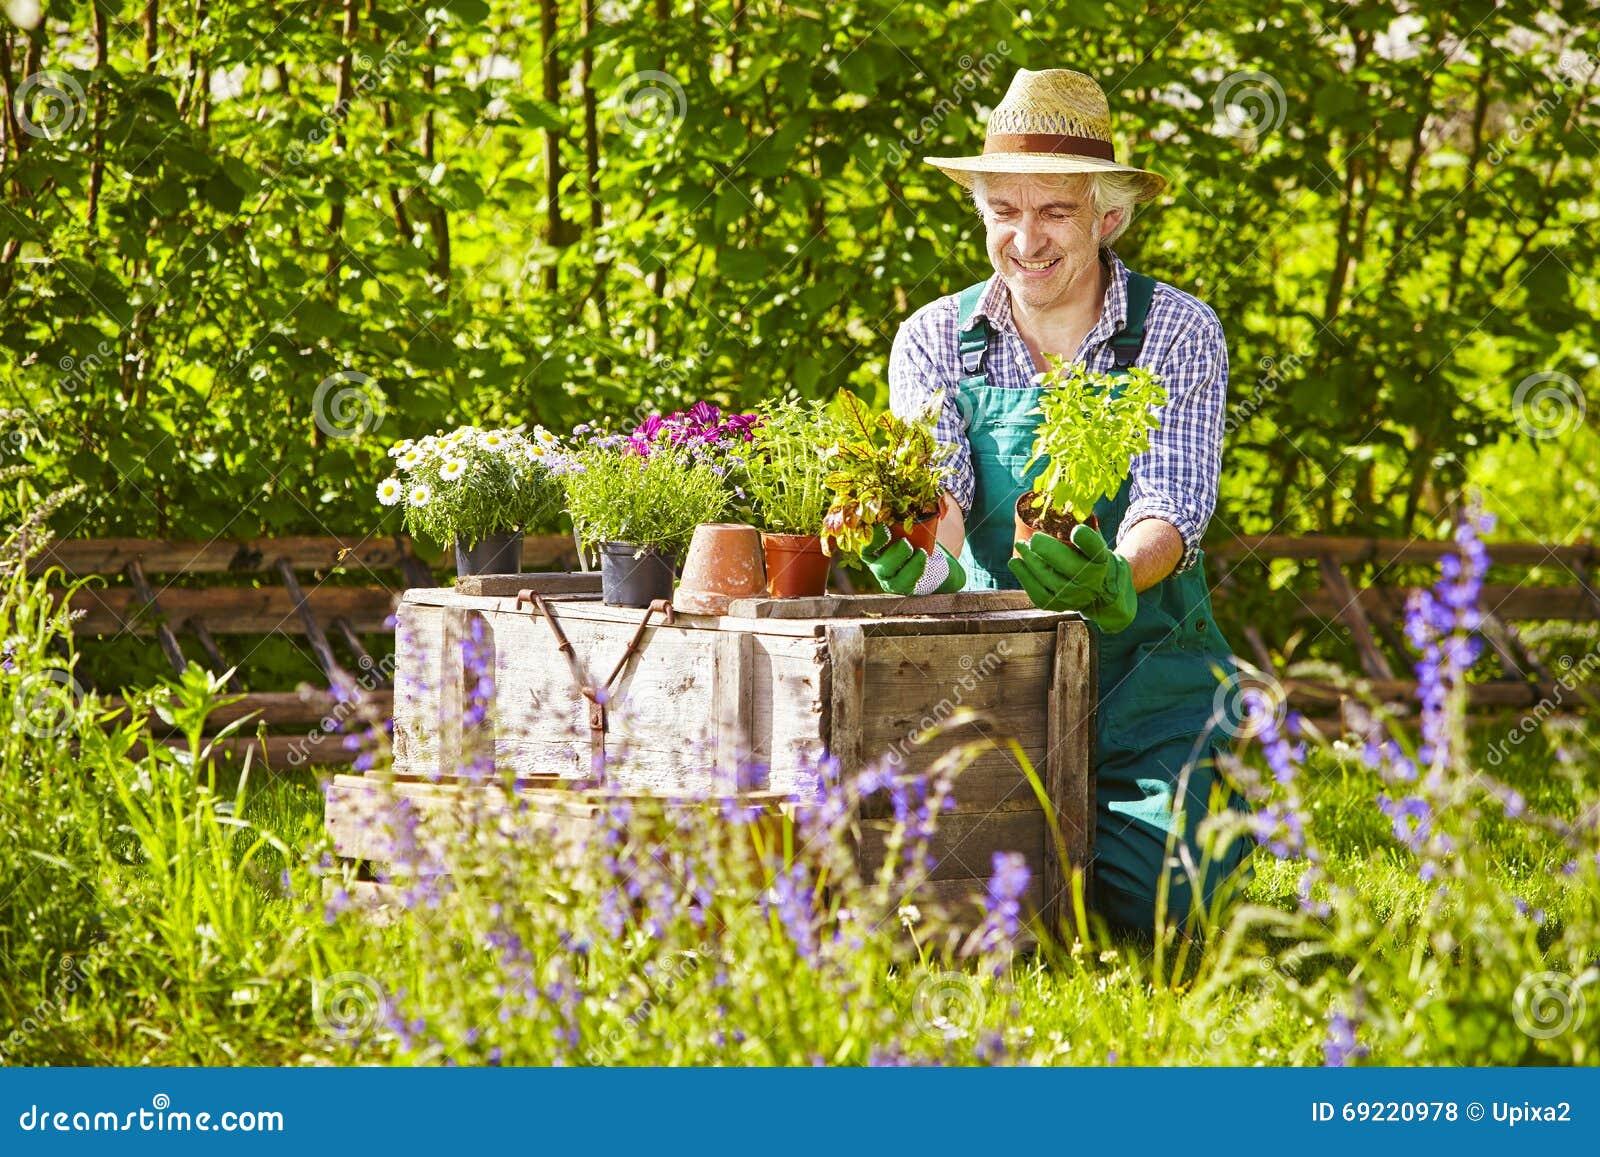 Plante De Jardin Of Le Chapeau De Paille De Jardinier Plante Le Jardin Photo Stock Image 69220978